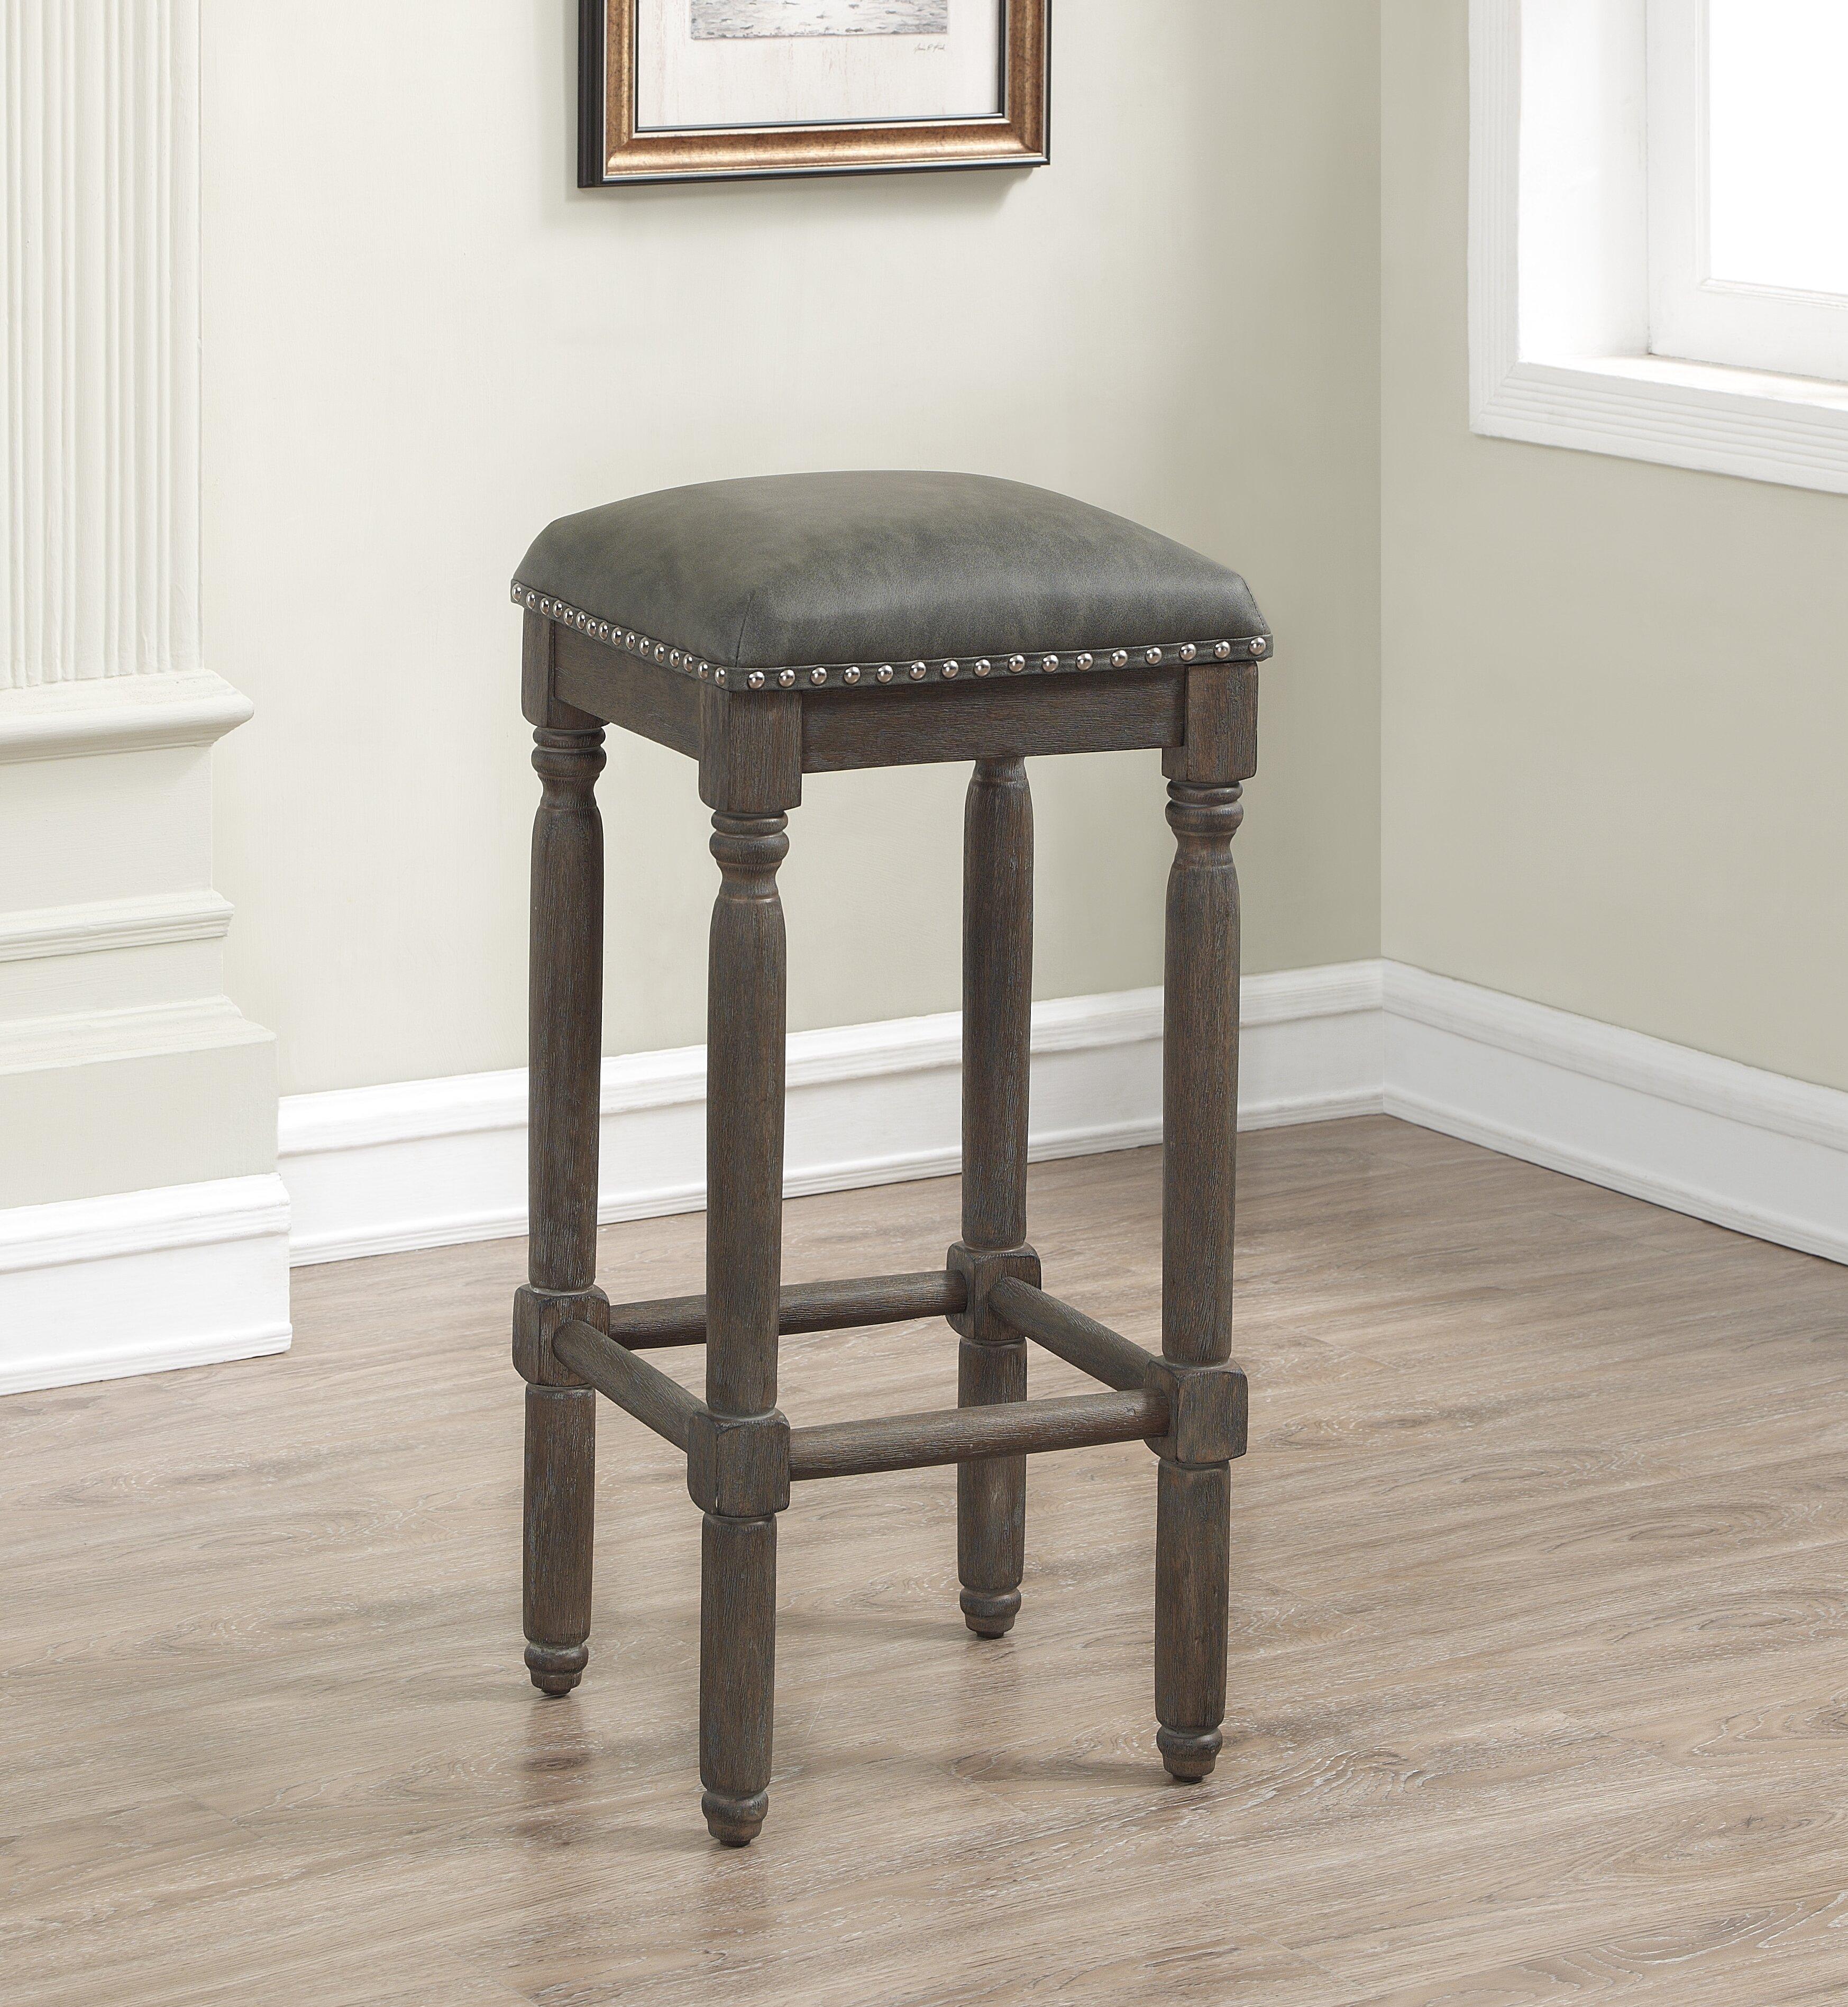 Tremendous Jeanlouis Bar Counter Stool Bralicious Painted Fabric Chair Ideas Braliciousco